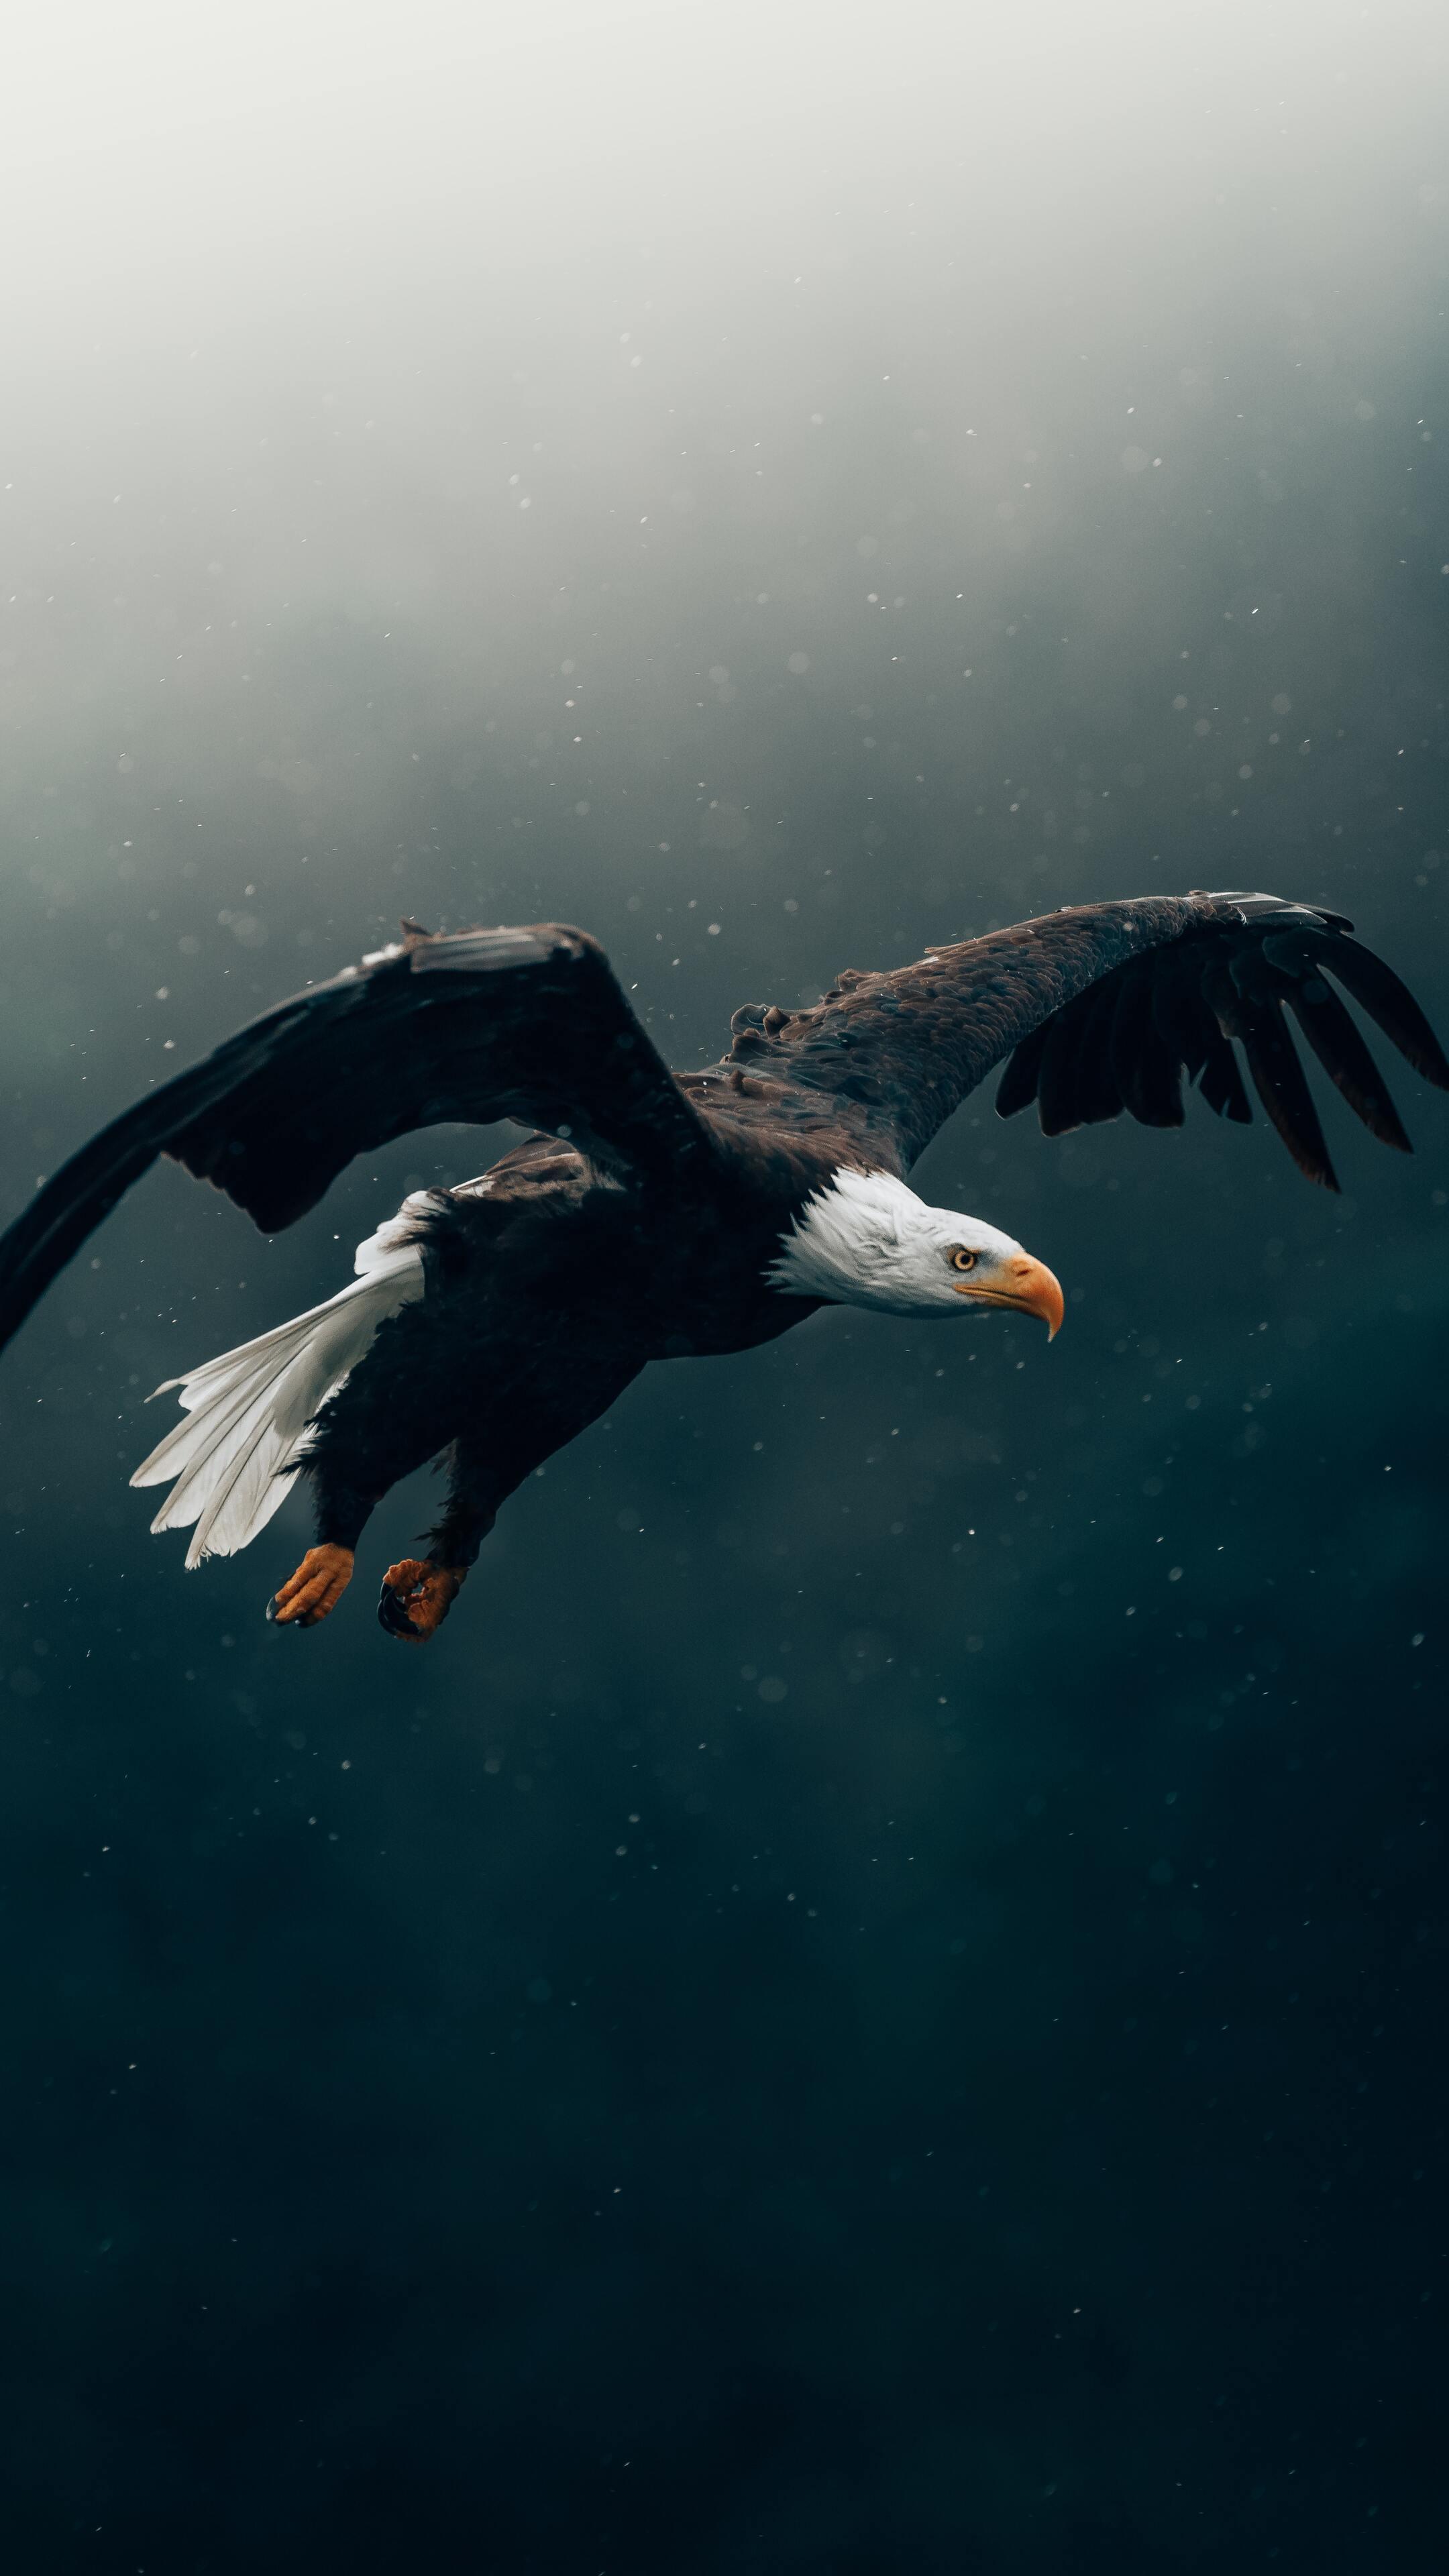 bald-eagle-flying-4k-7w.jpg